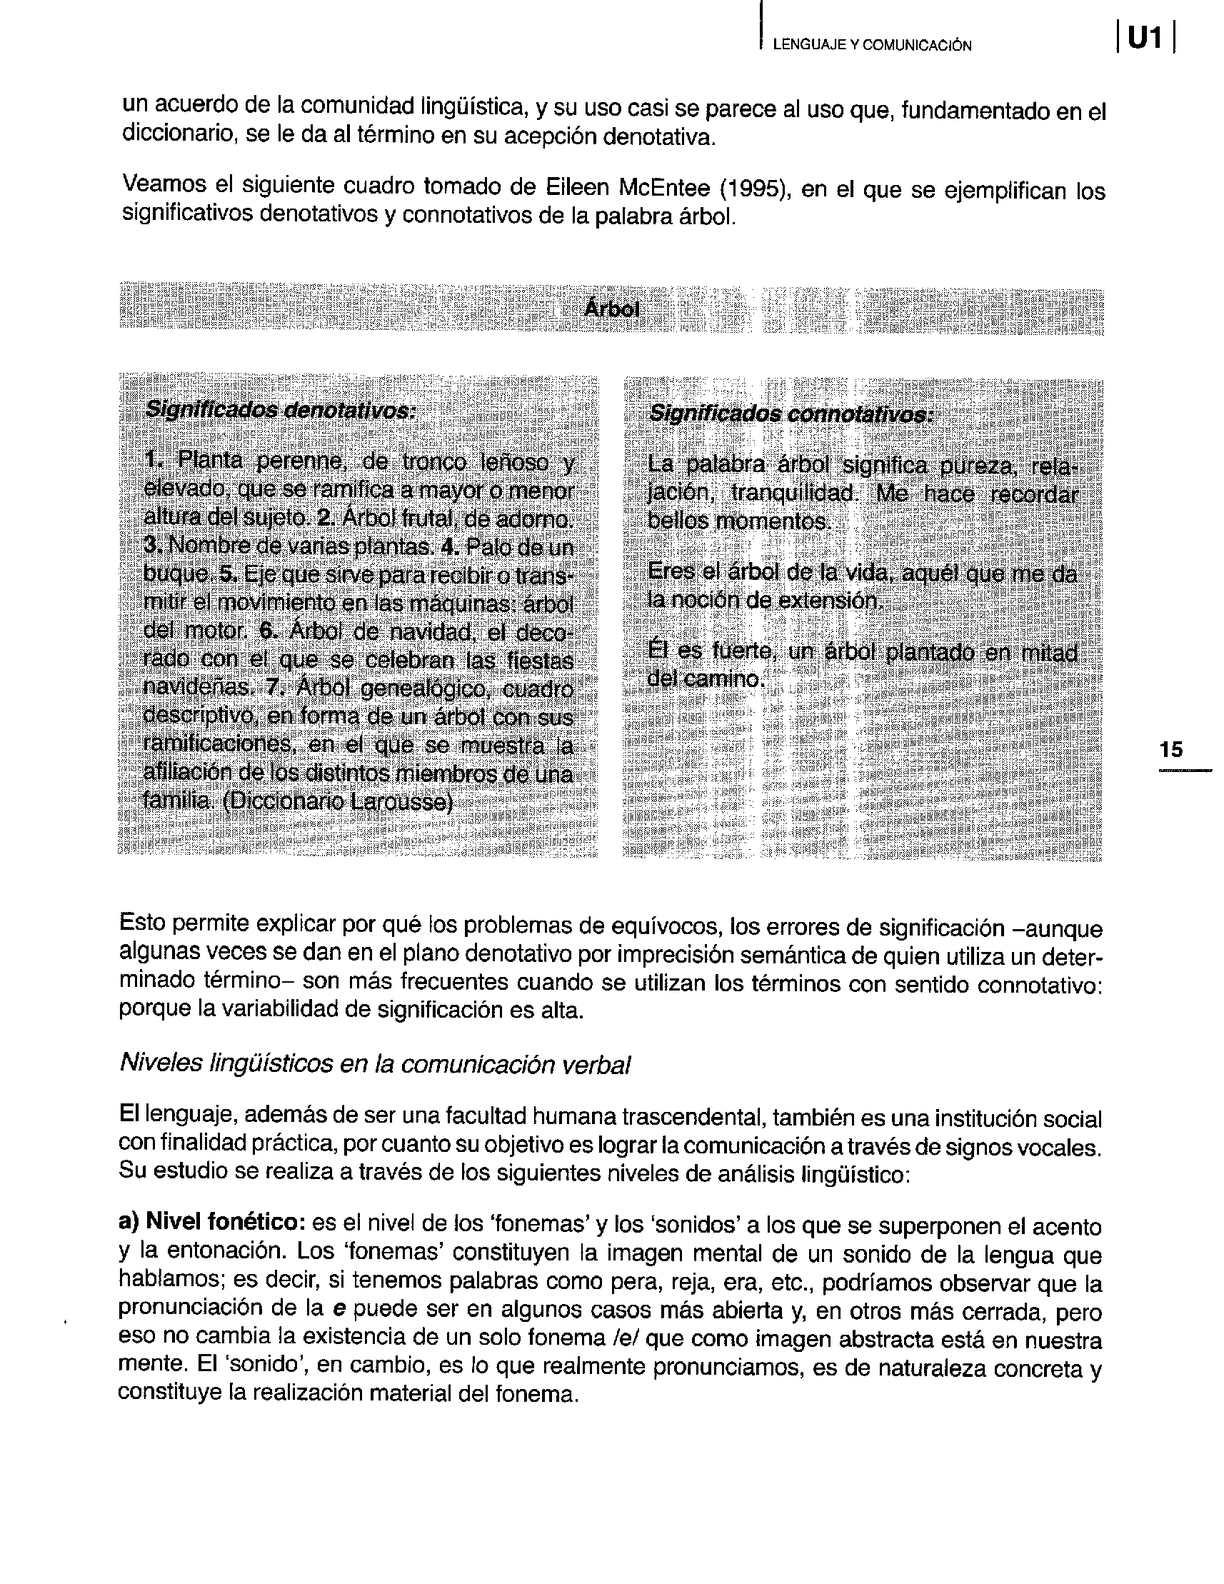 Lenguaje Y Comunicación - CALAMEO Downloader